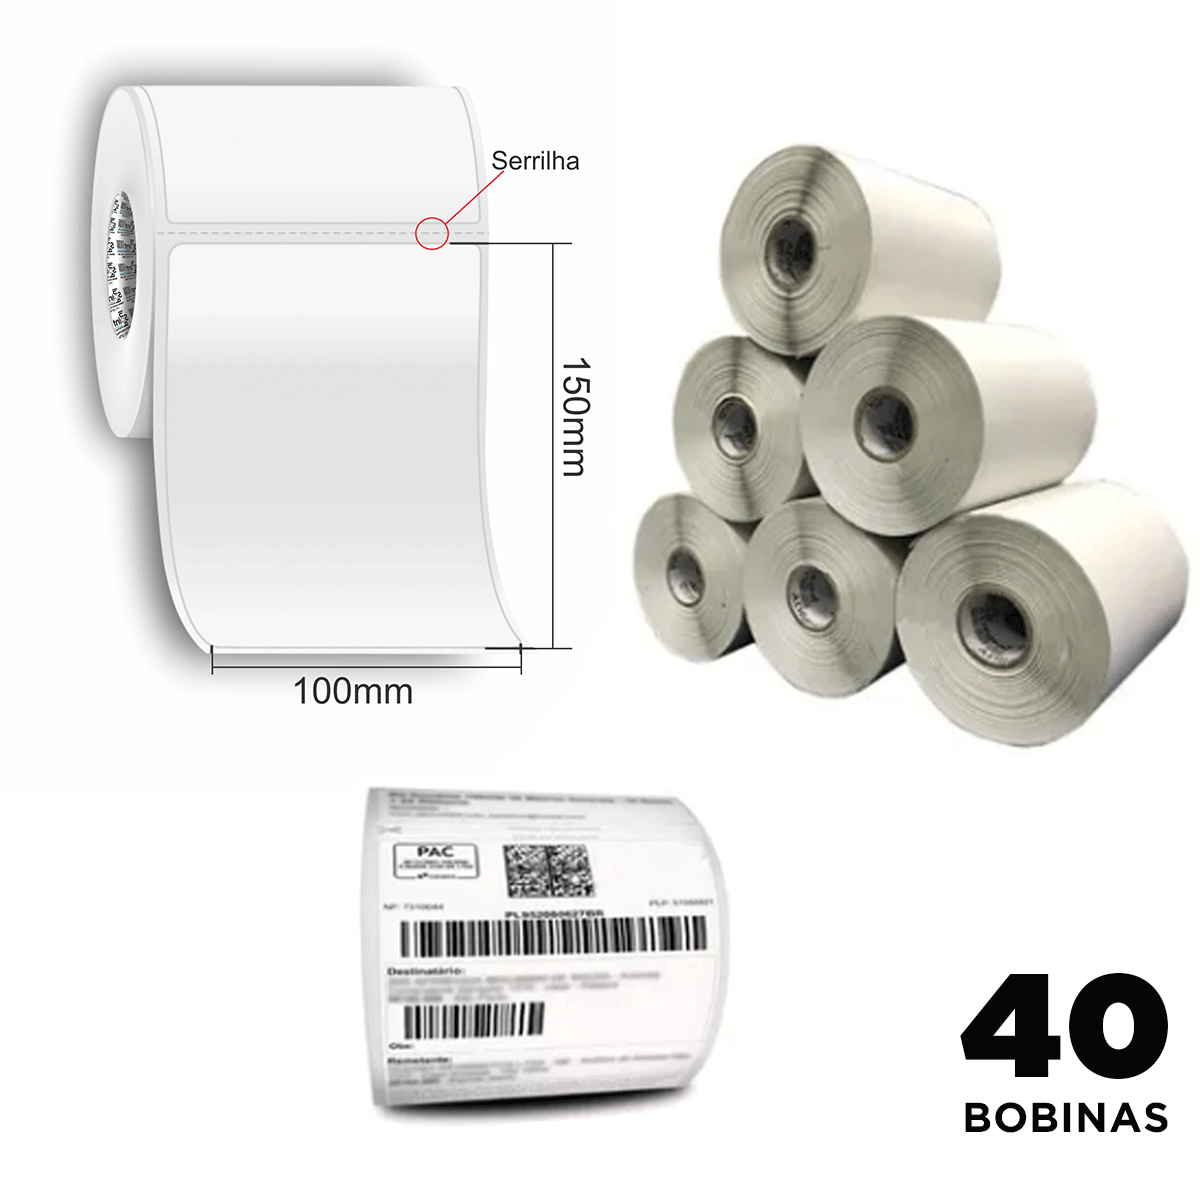 40 Rolos de Etiquetas Premium 10x15 Neutra Branca Serrilha Mercado Envios